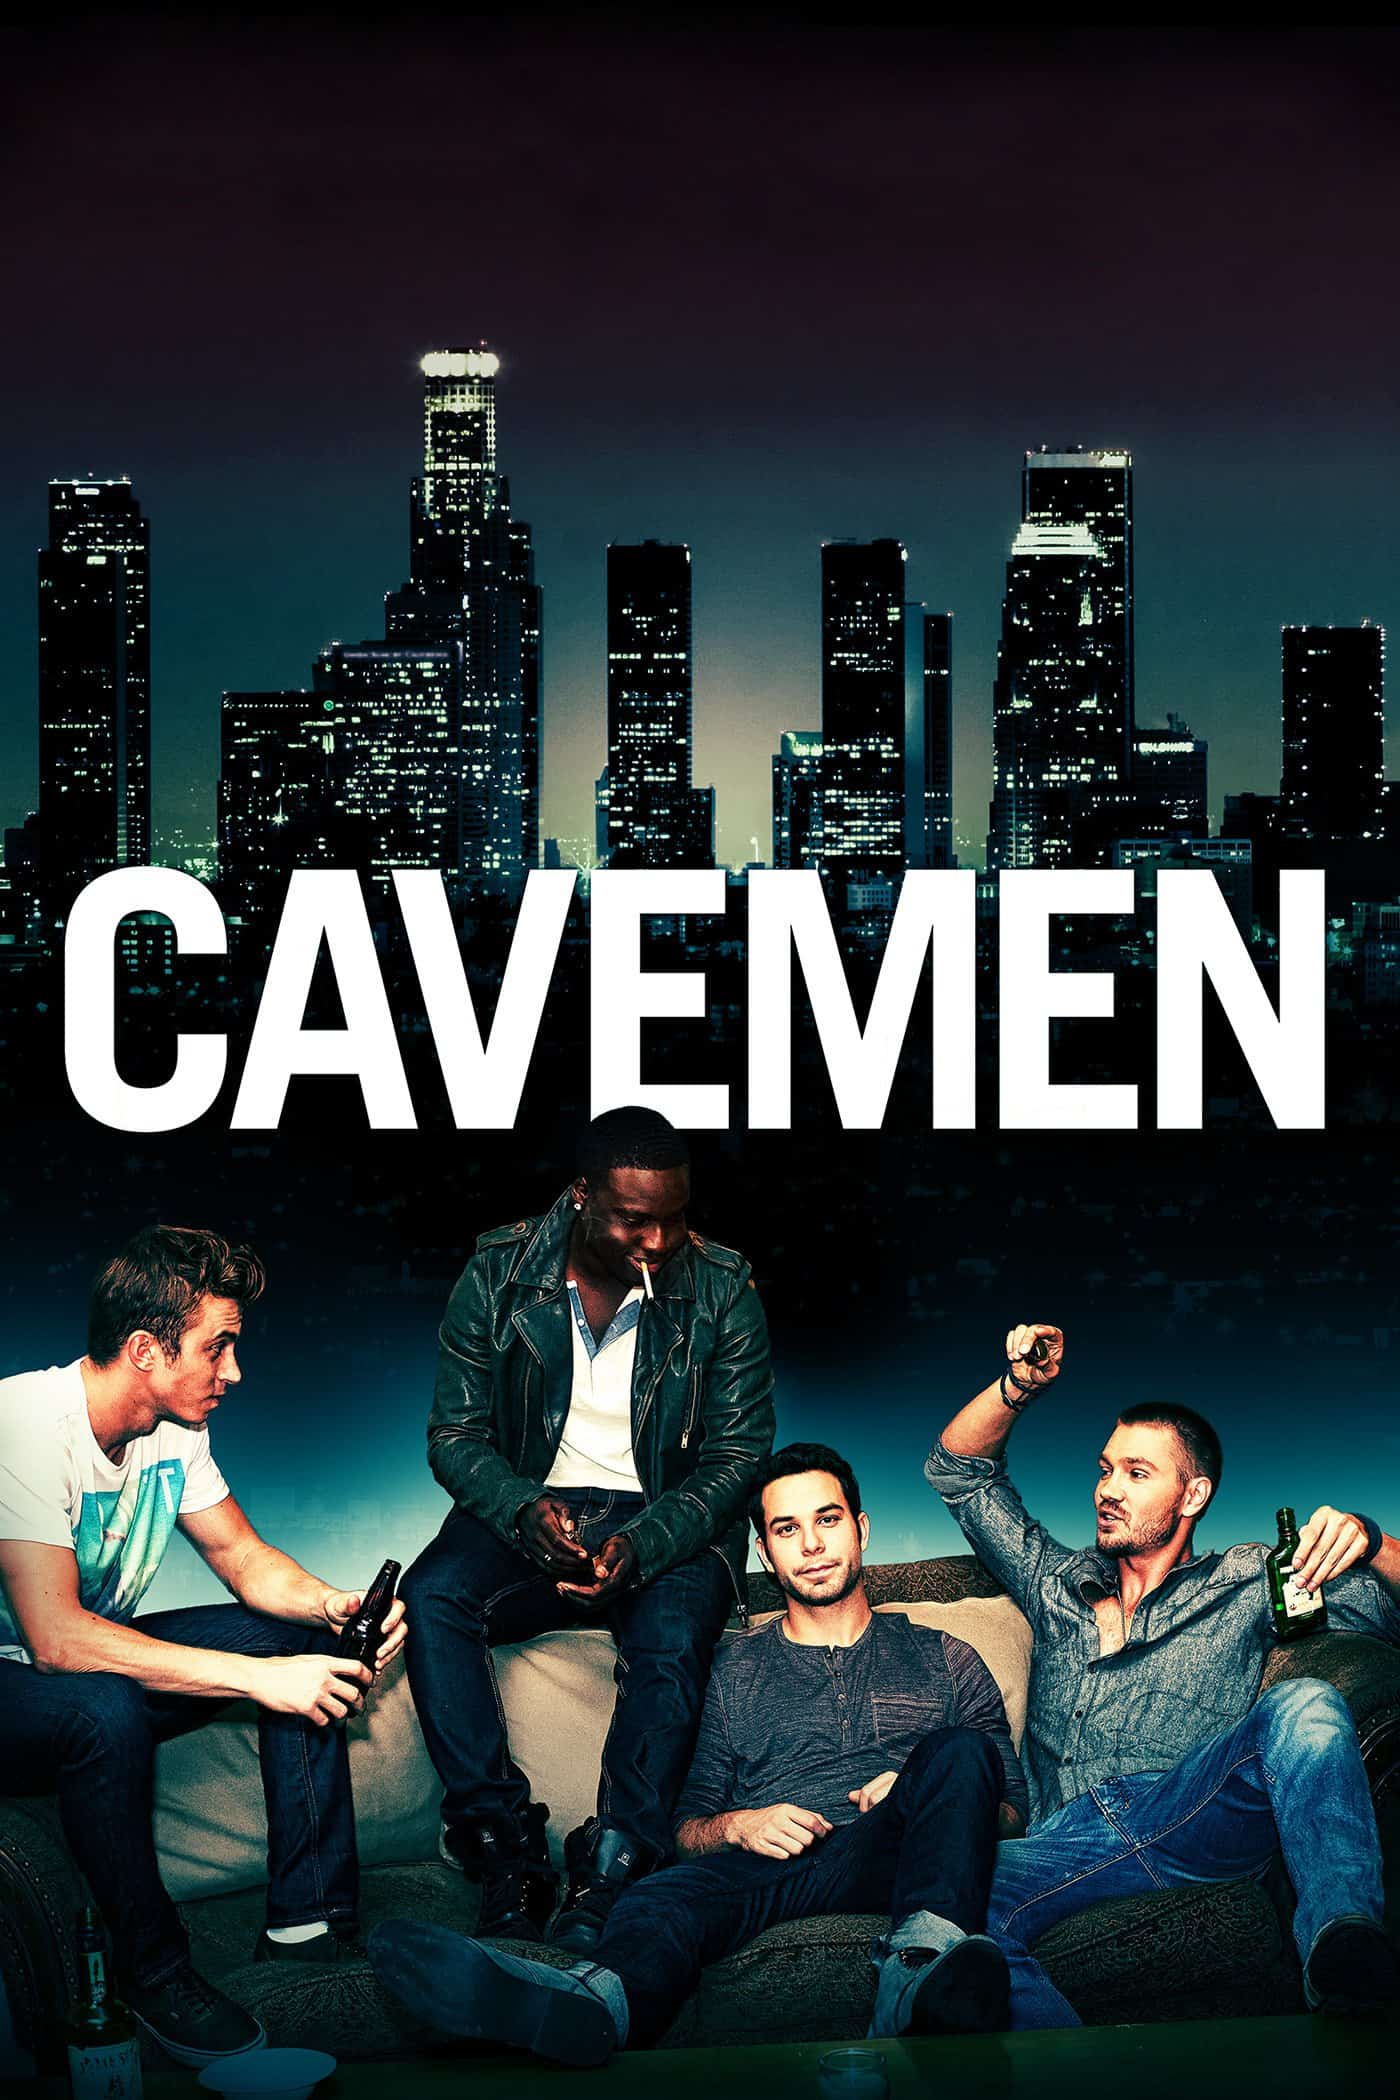 Cavemen, 2013